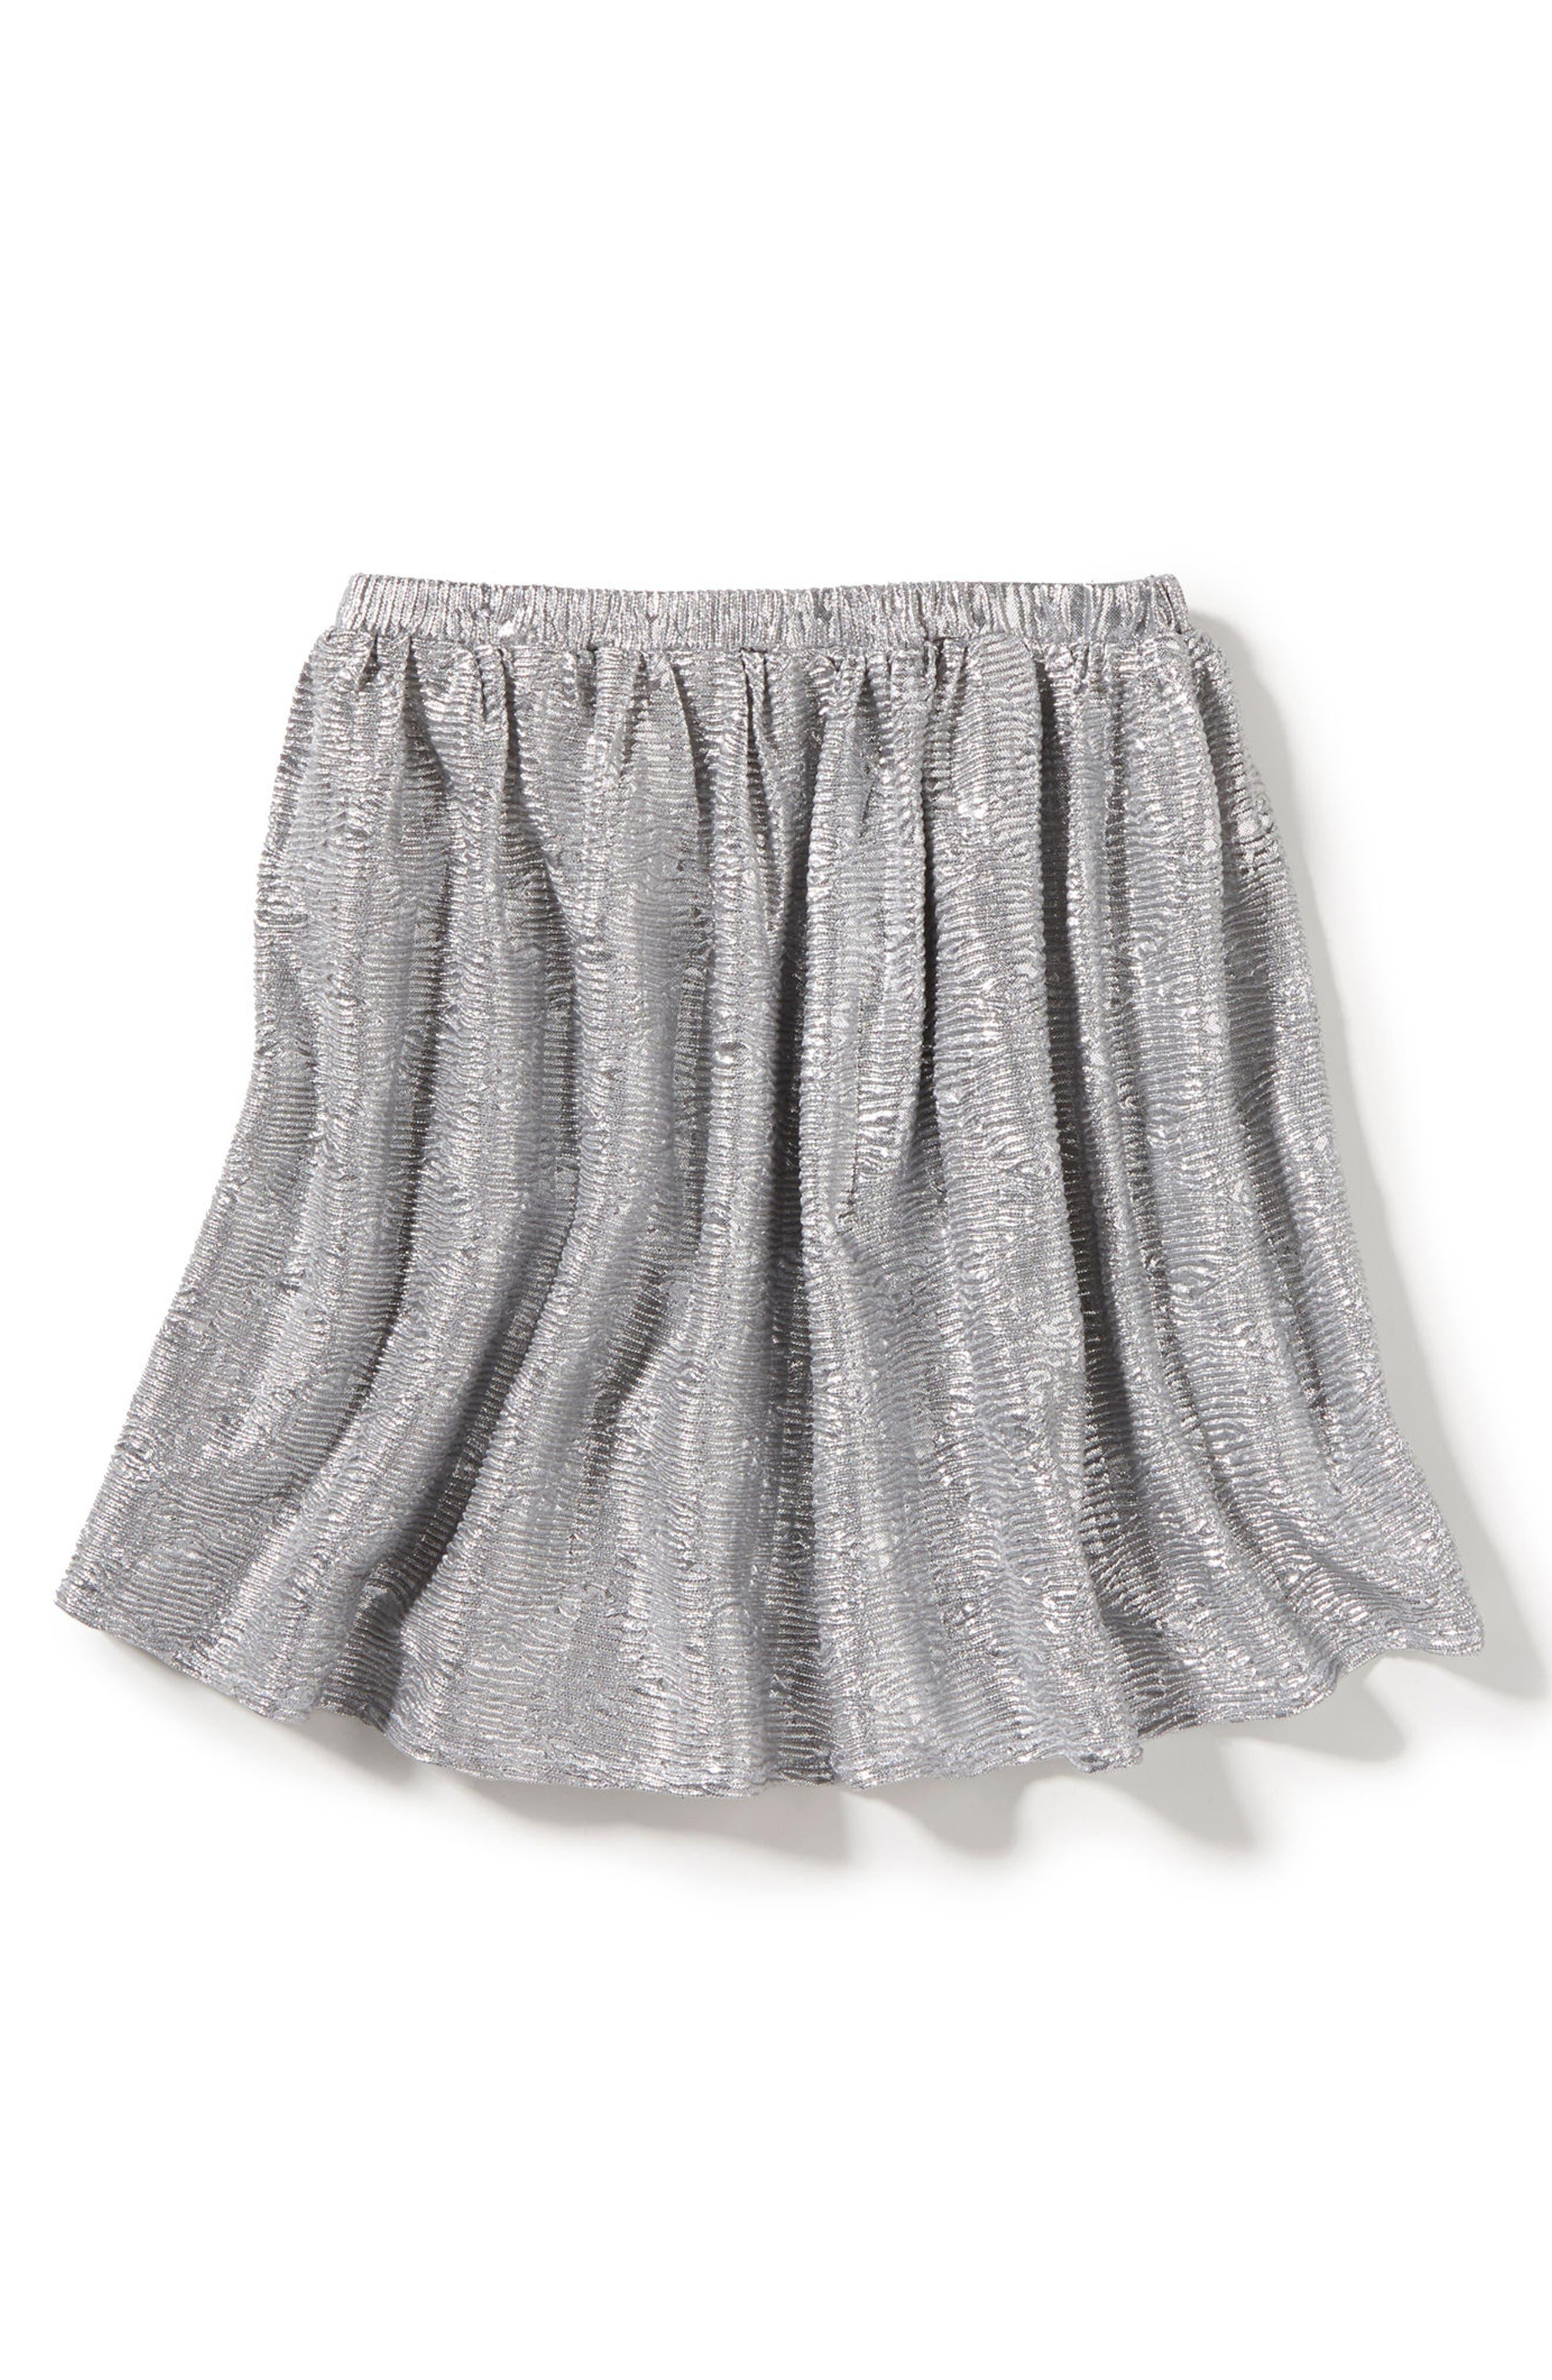 Marlow Metallic Skirt,                         Main,                         color, Silver